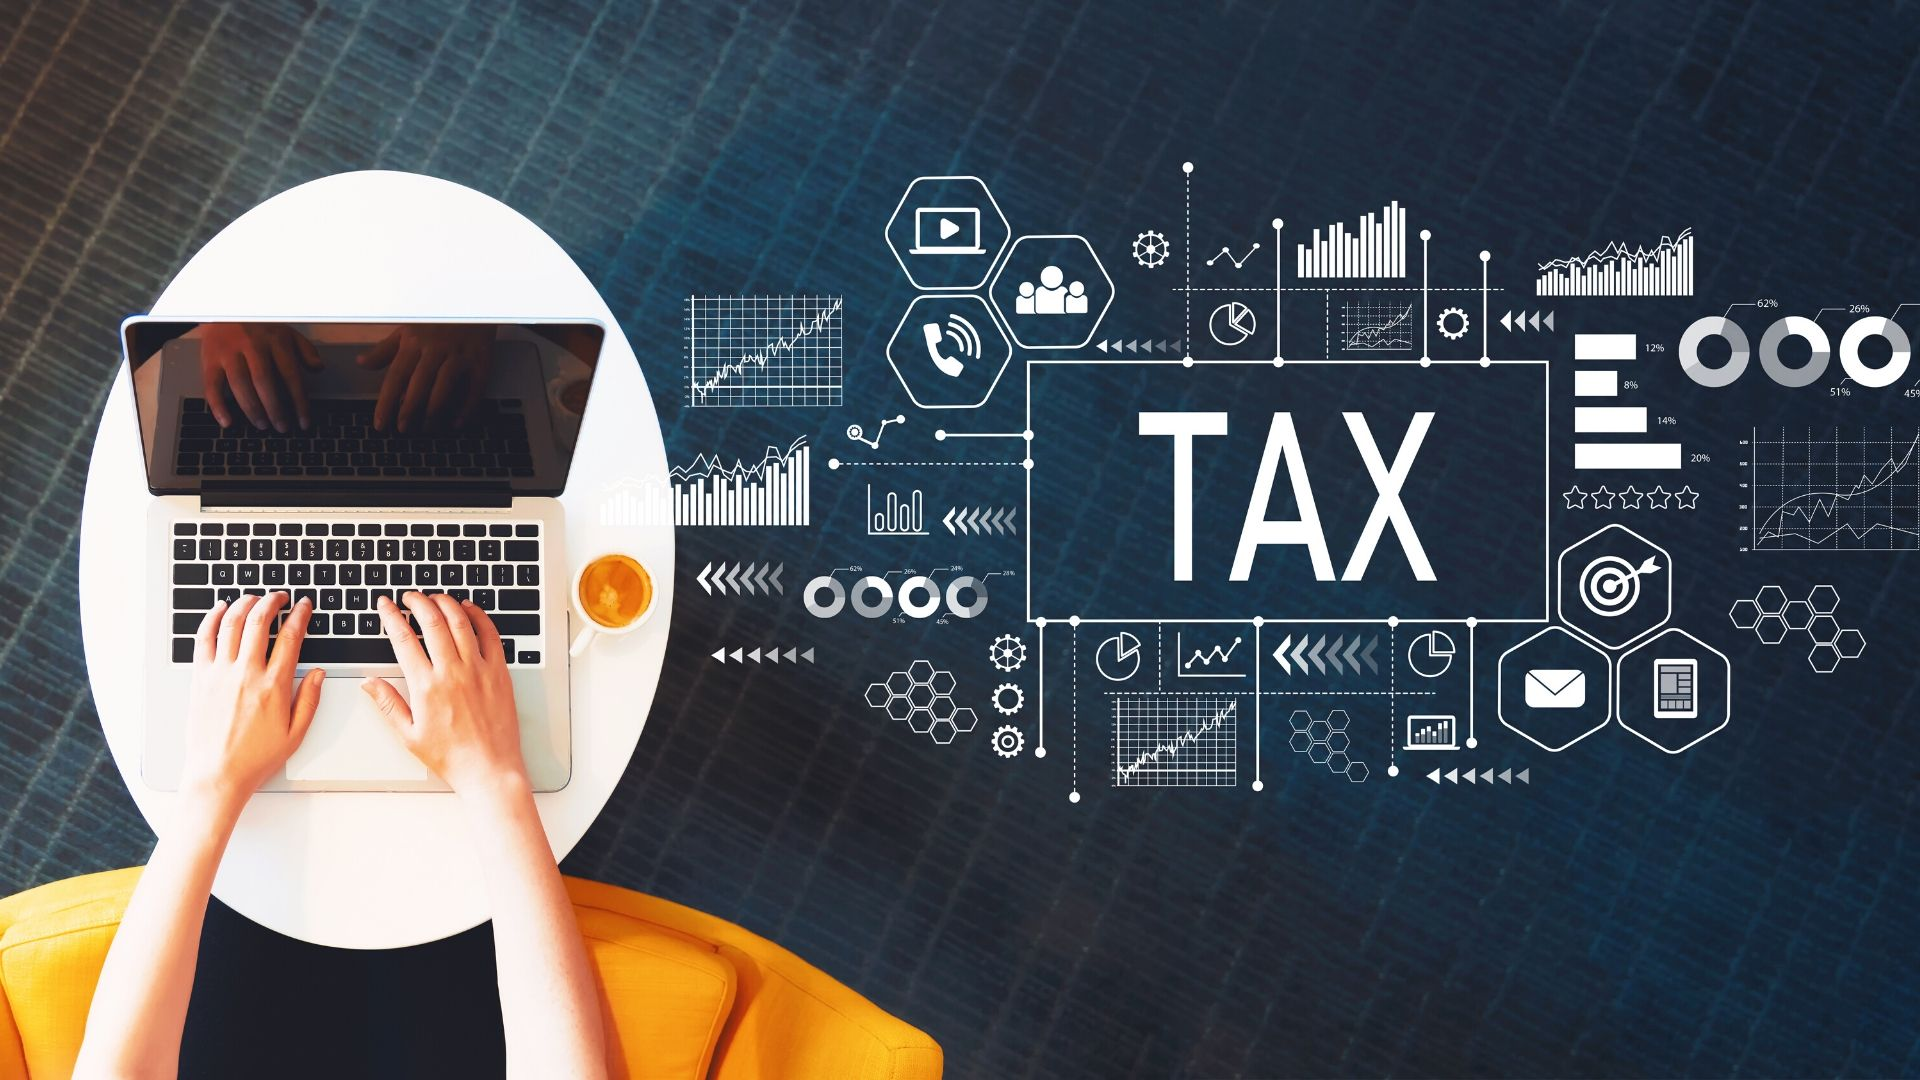 La Grande Bretagne lance à son tour une taxe GAFA